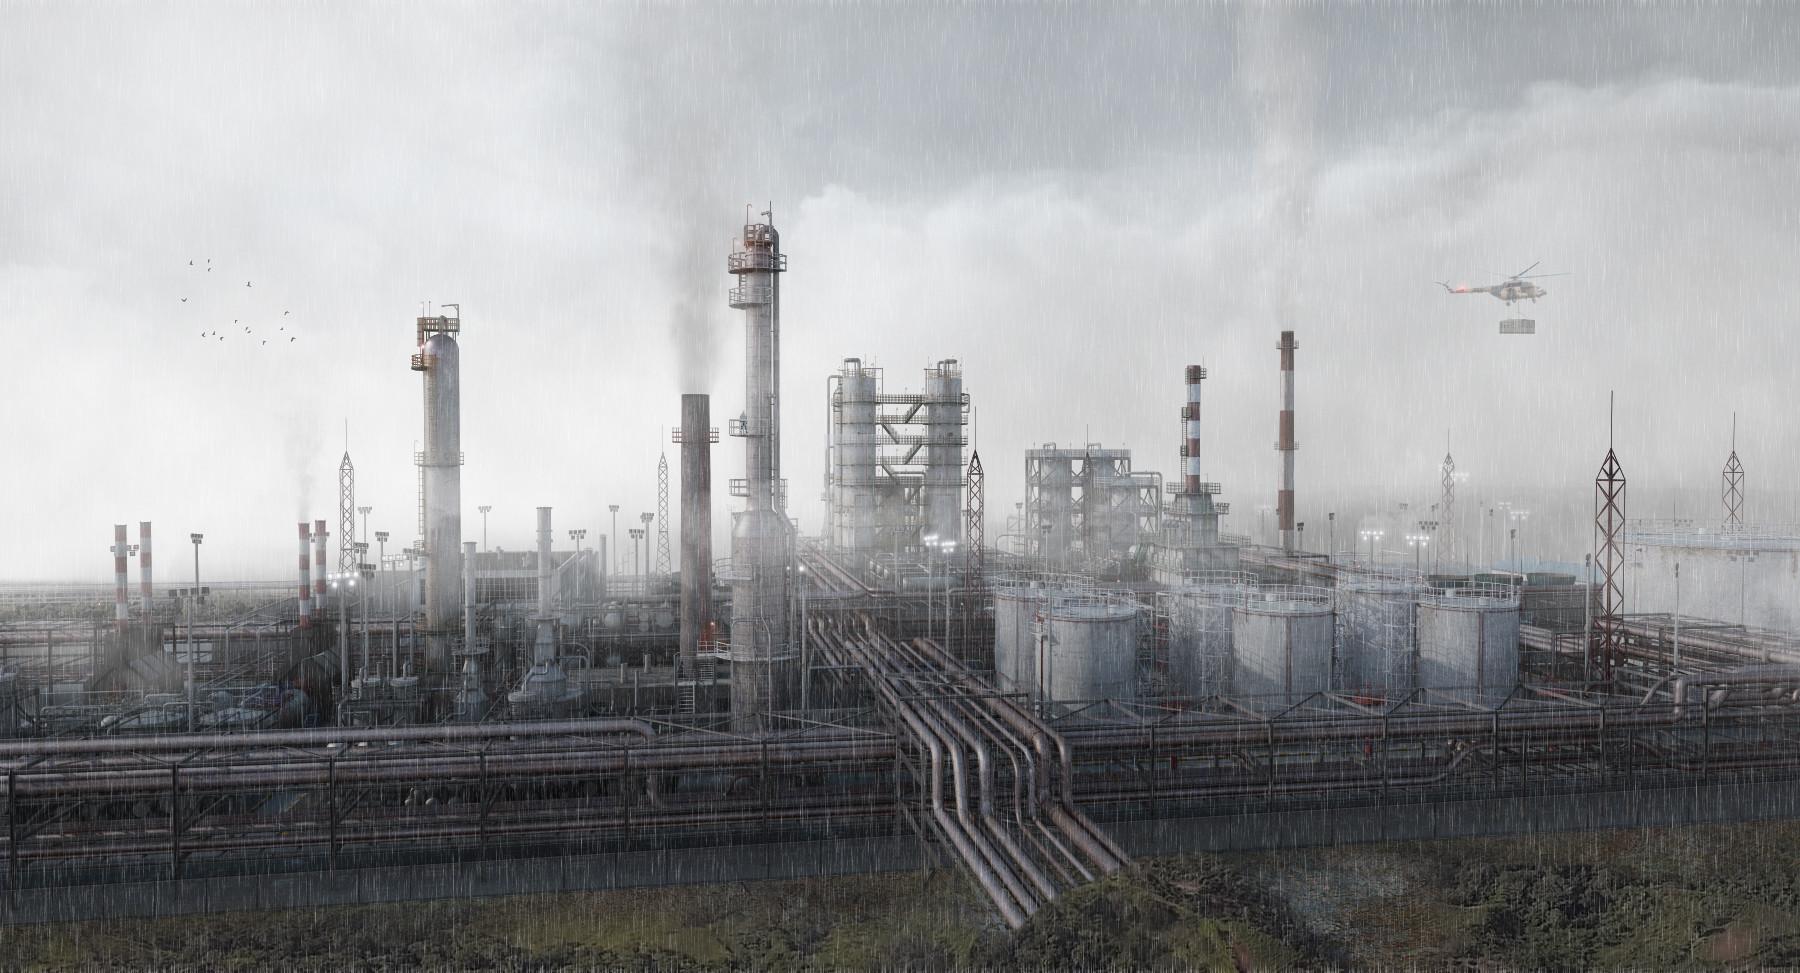 Elvin taghiyev final refinery